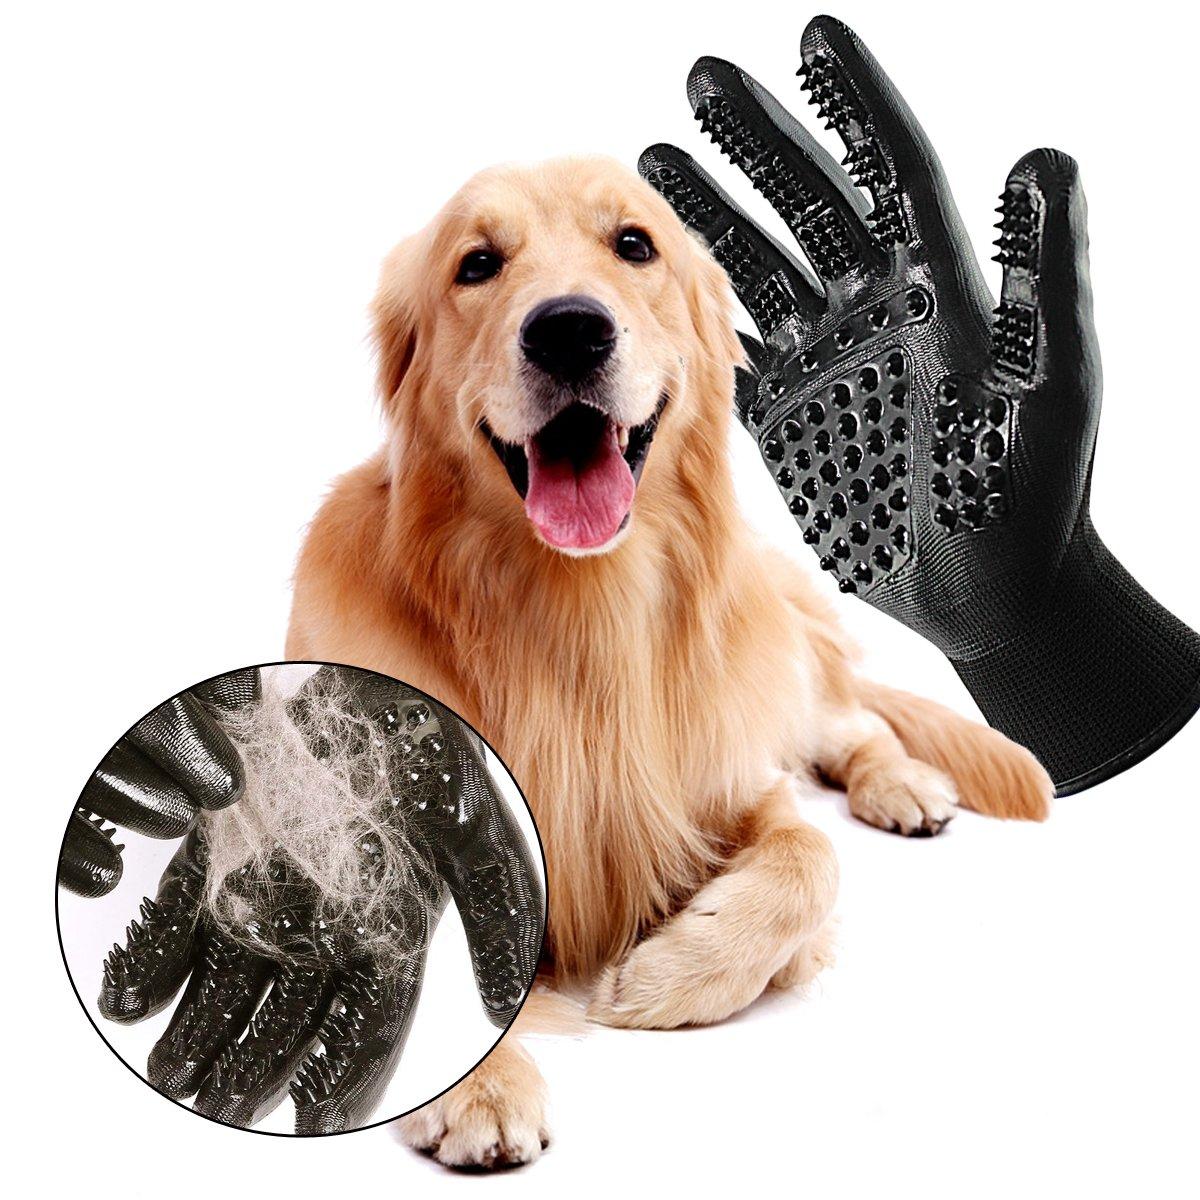 Swissdigital Pet Grooming Glove, Five Finger Deshedding Glove Brush Gloves for Dogs Cats Horses Grooming Tool Furniture Pet Hair Rmover Mitt, One Pair,Black SD-MH-T805